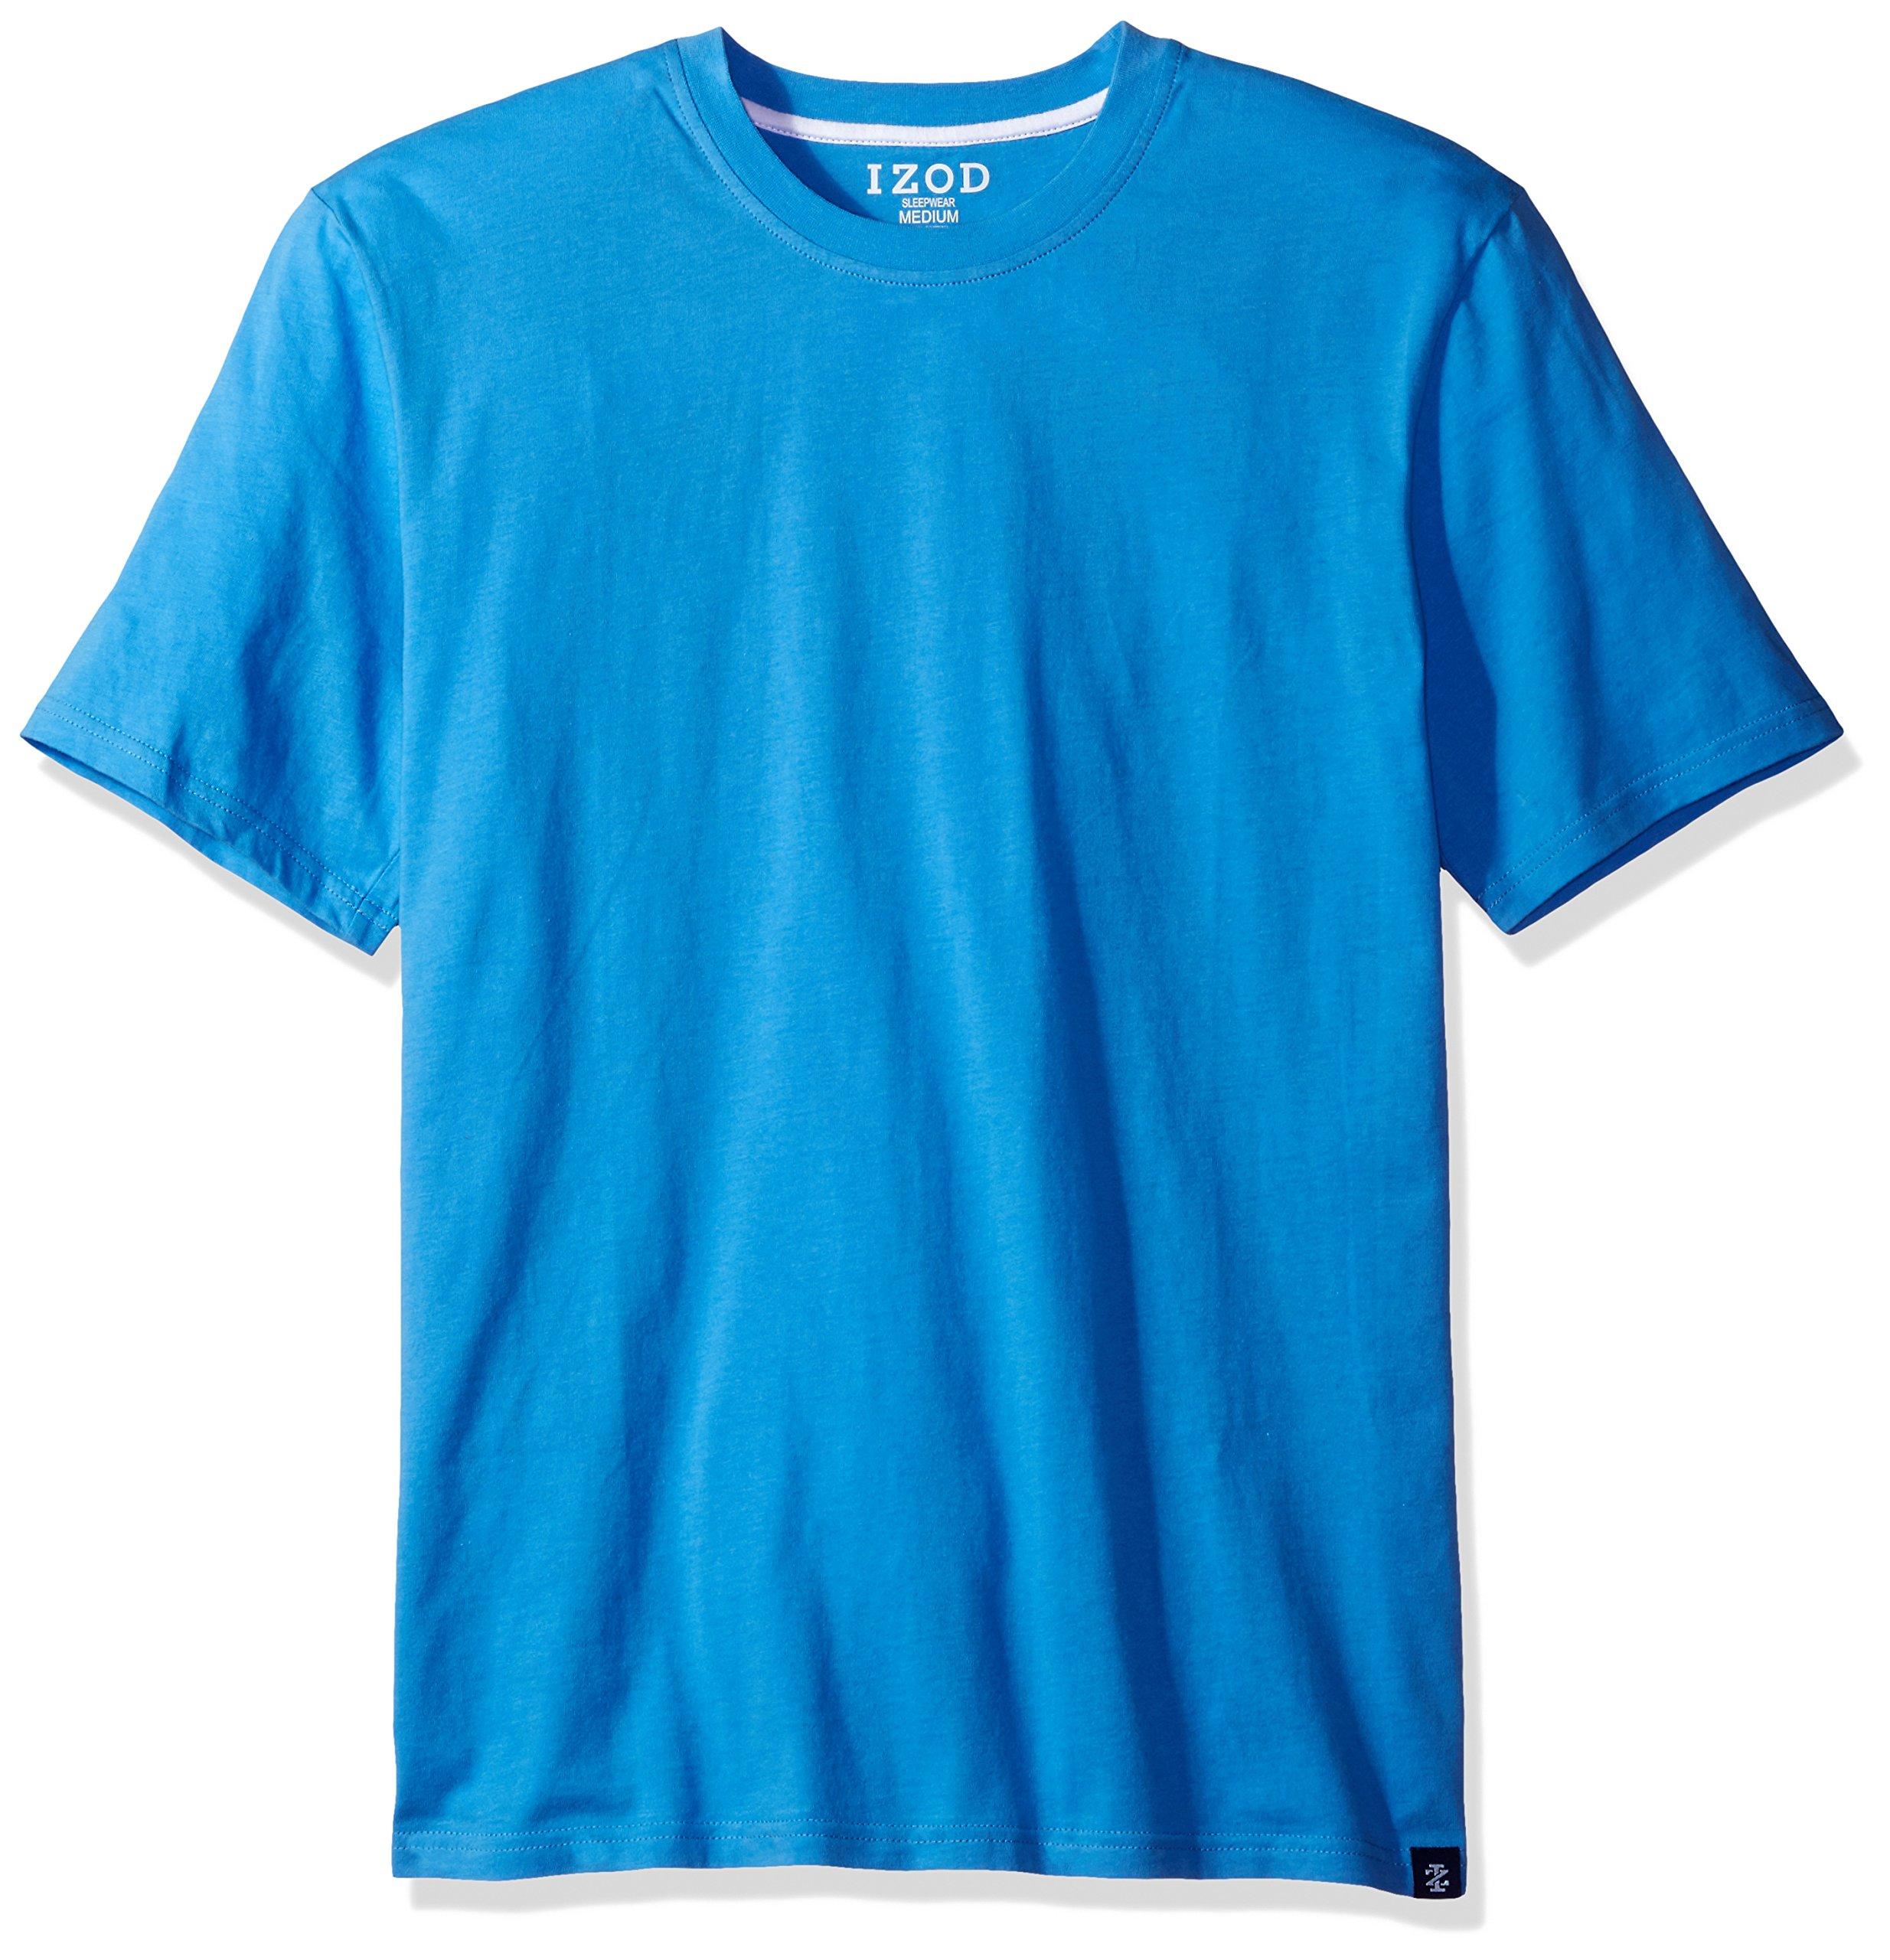 IZOD Men's Jersey Knit Sleep Shirt, Regatta Blue, Small